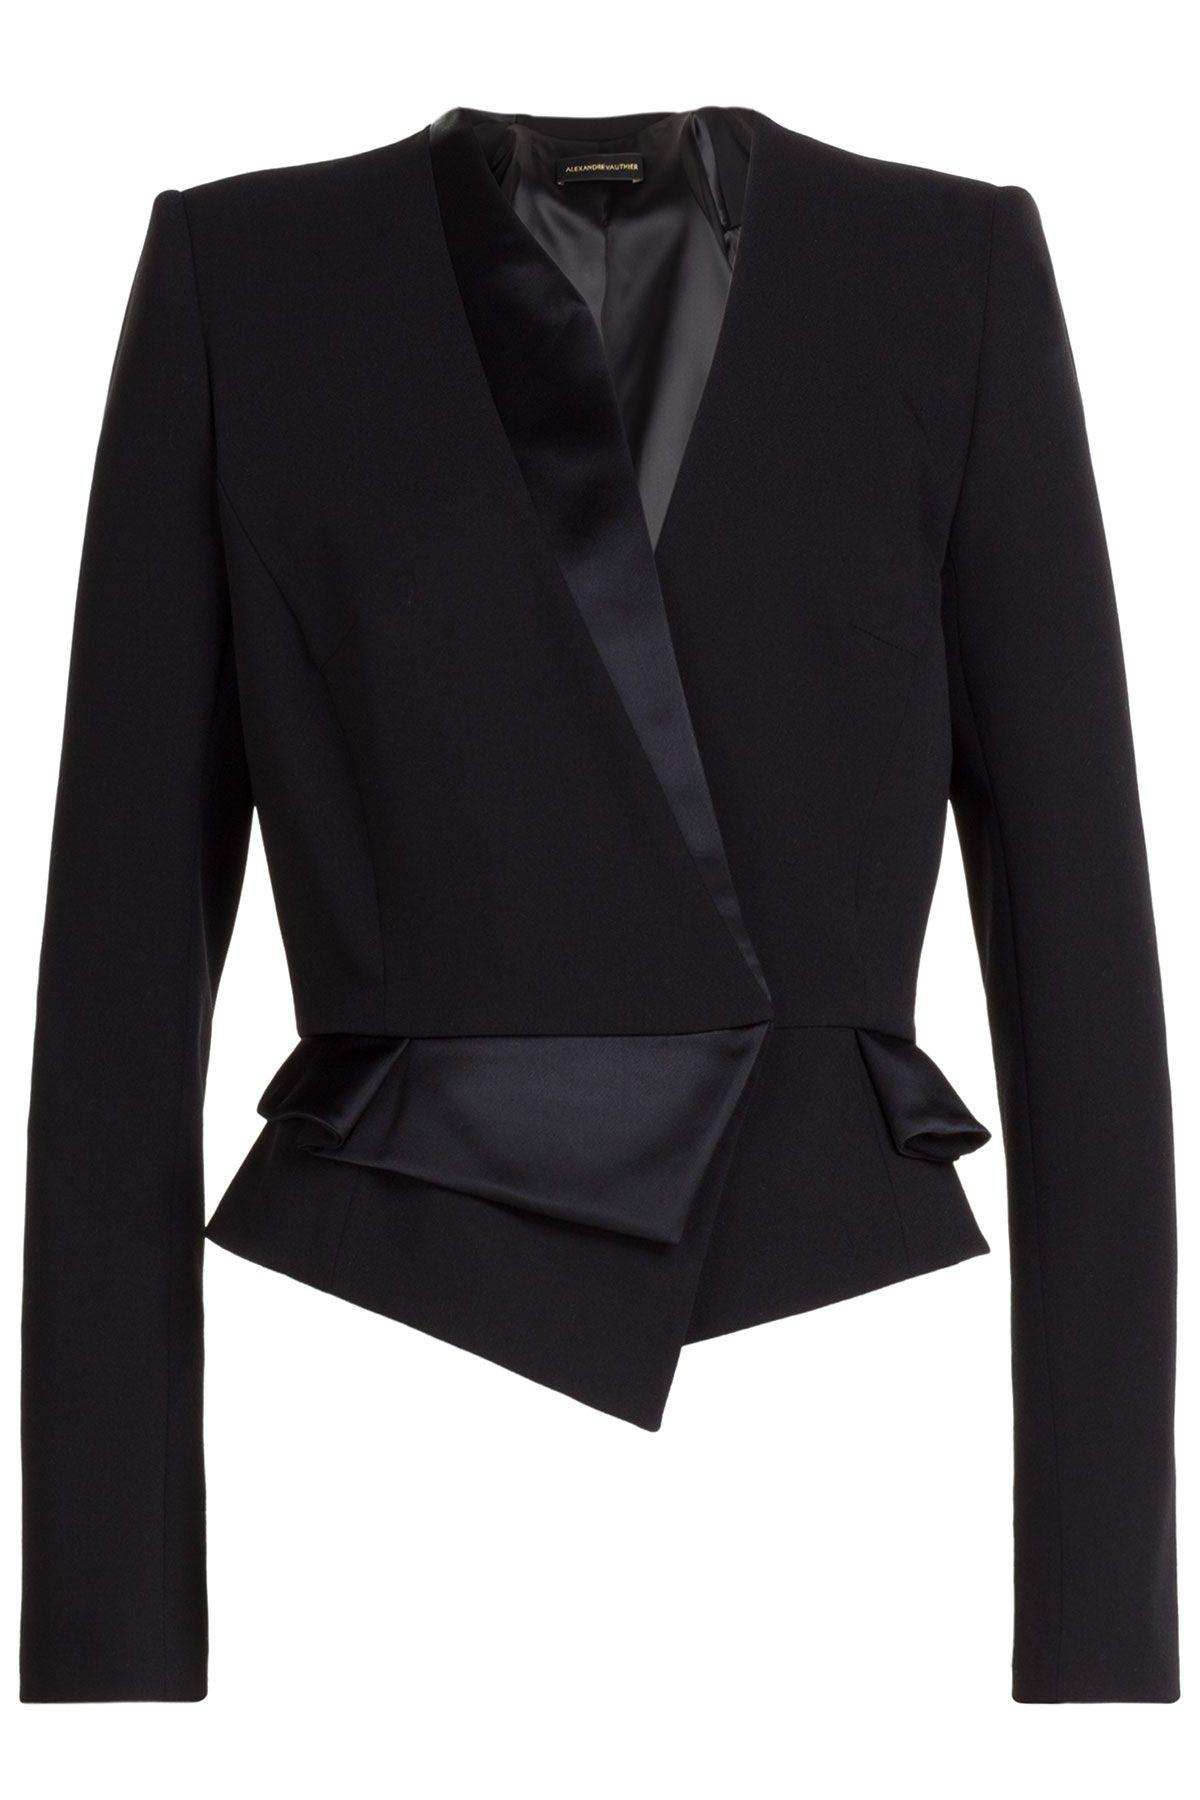 3830452e5 Women s Wool Blazer With Satin - Black